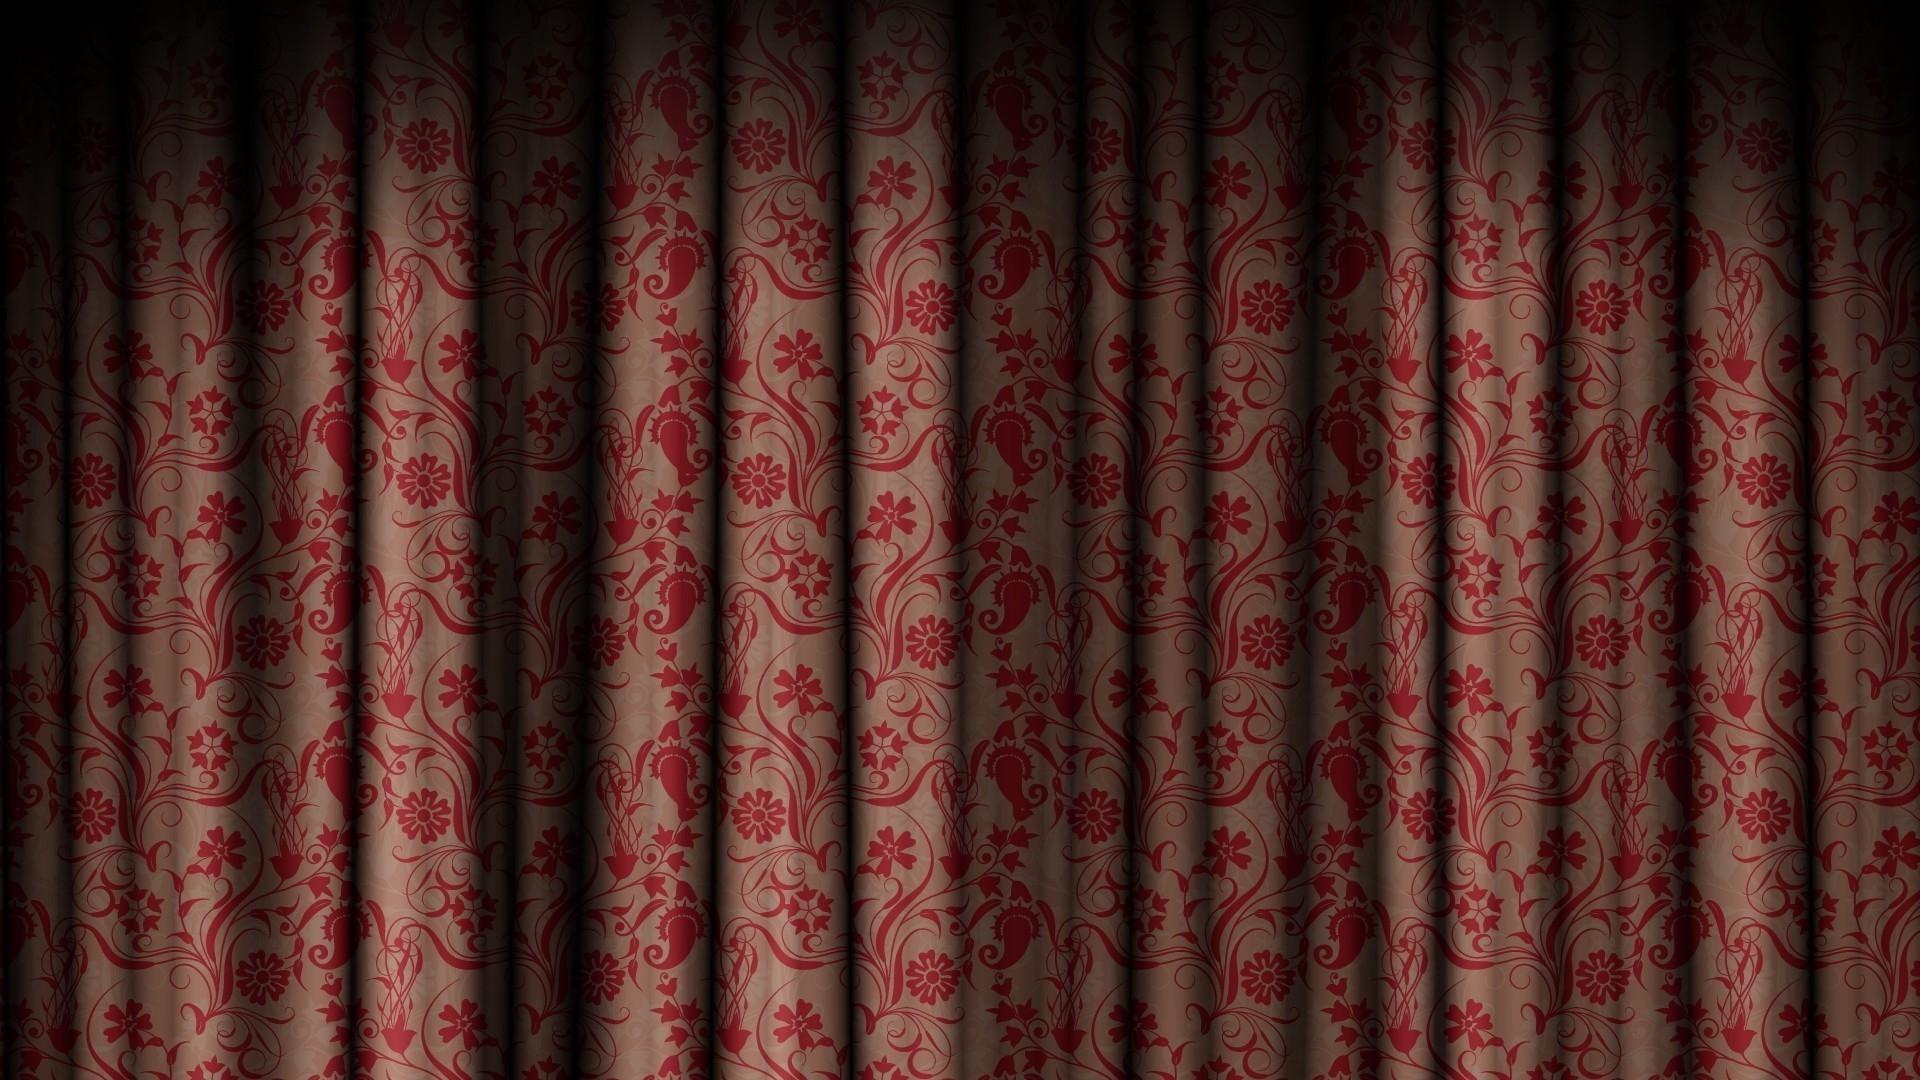 Curtain Wallpaper Wwwmyfamilylivingcom